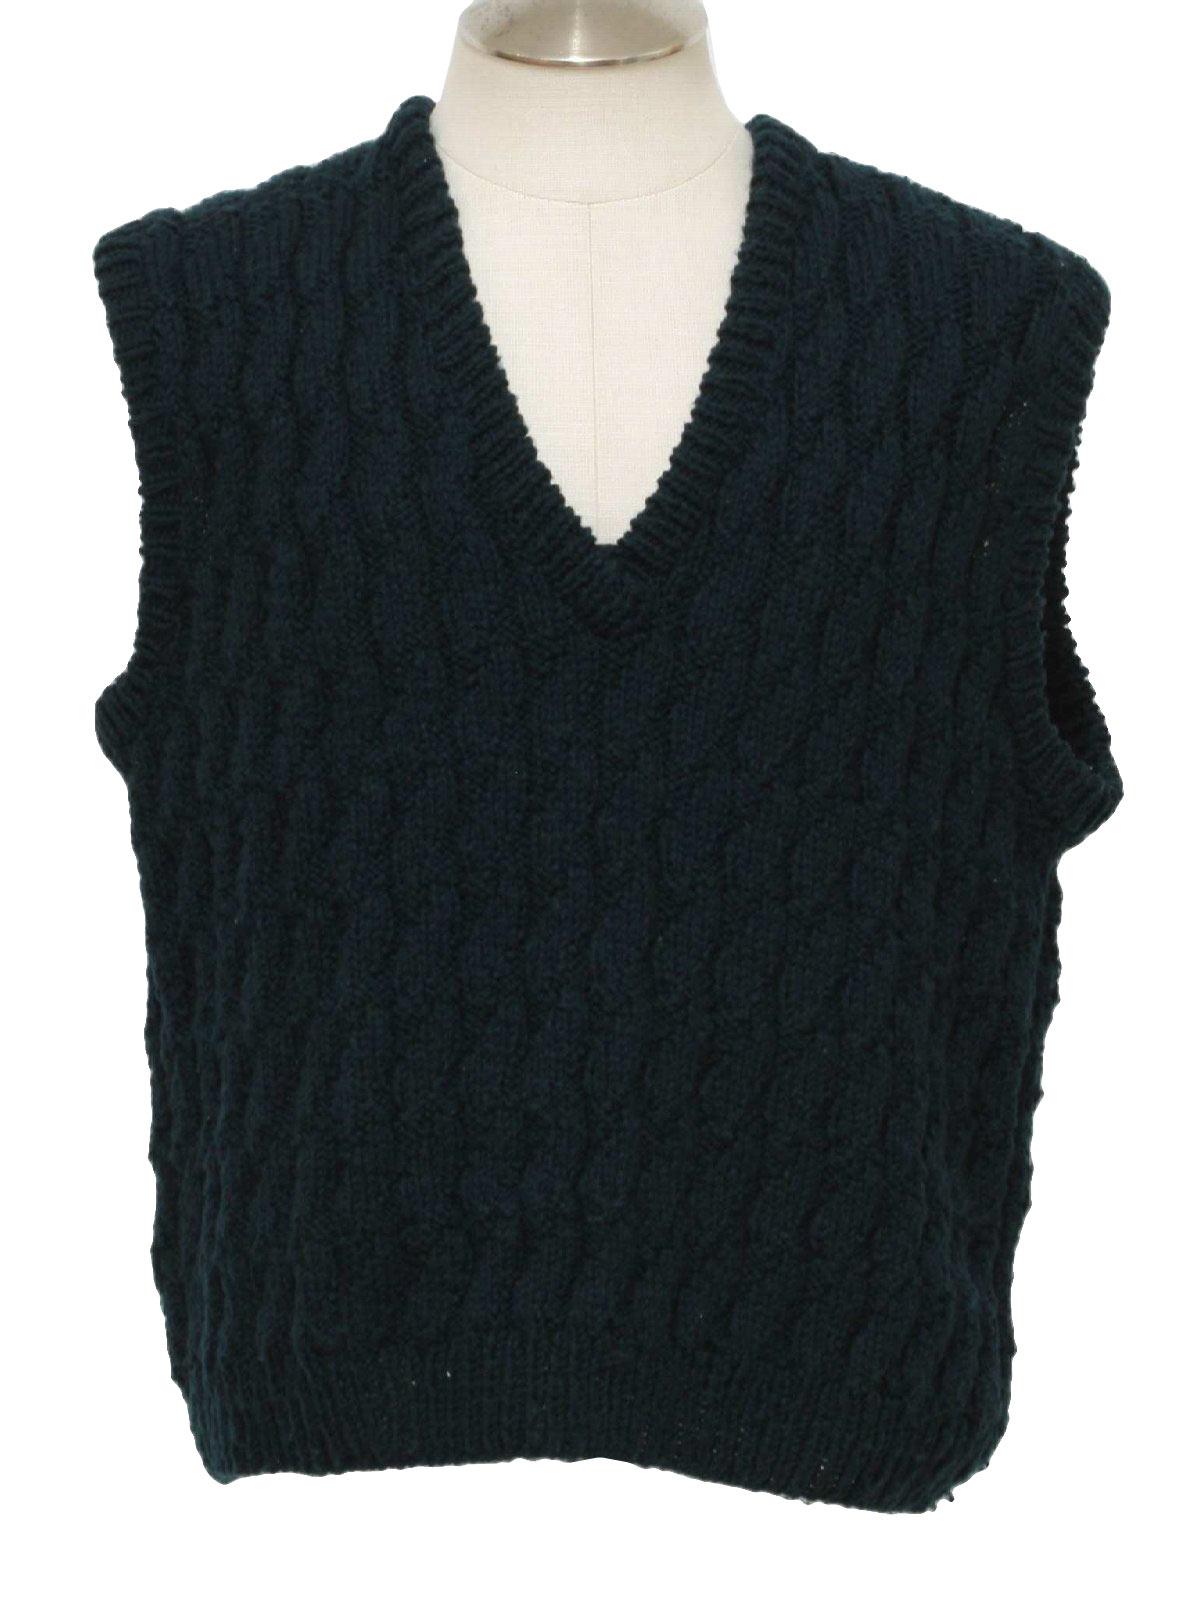 Knitting Pattern Men s Sweater Vest : Vintage 1990s Sweater: 90s -No Label- Mens deep emerald ...